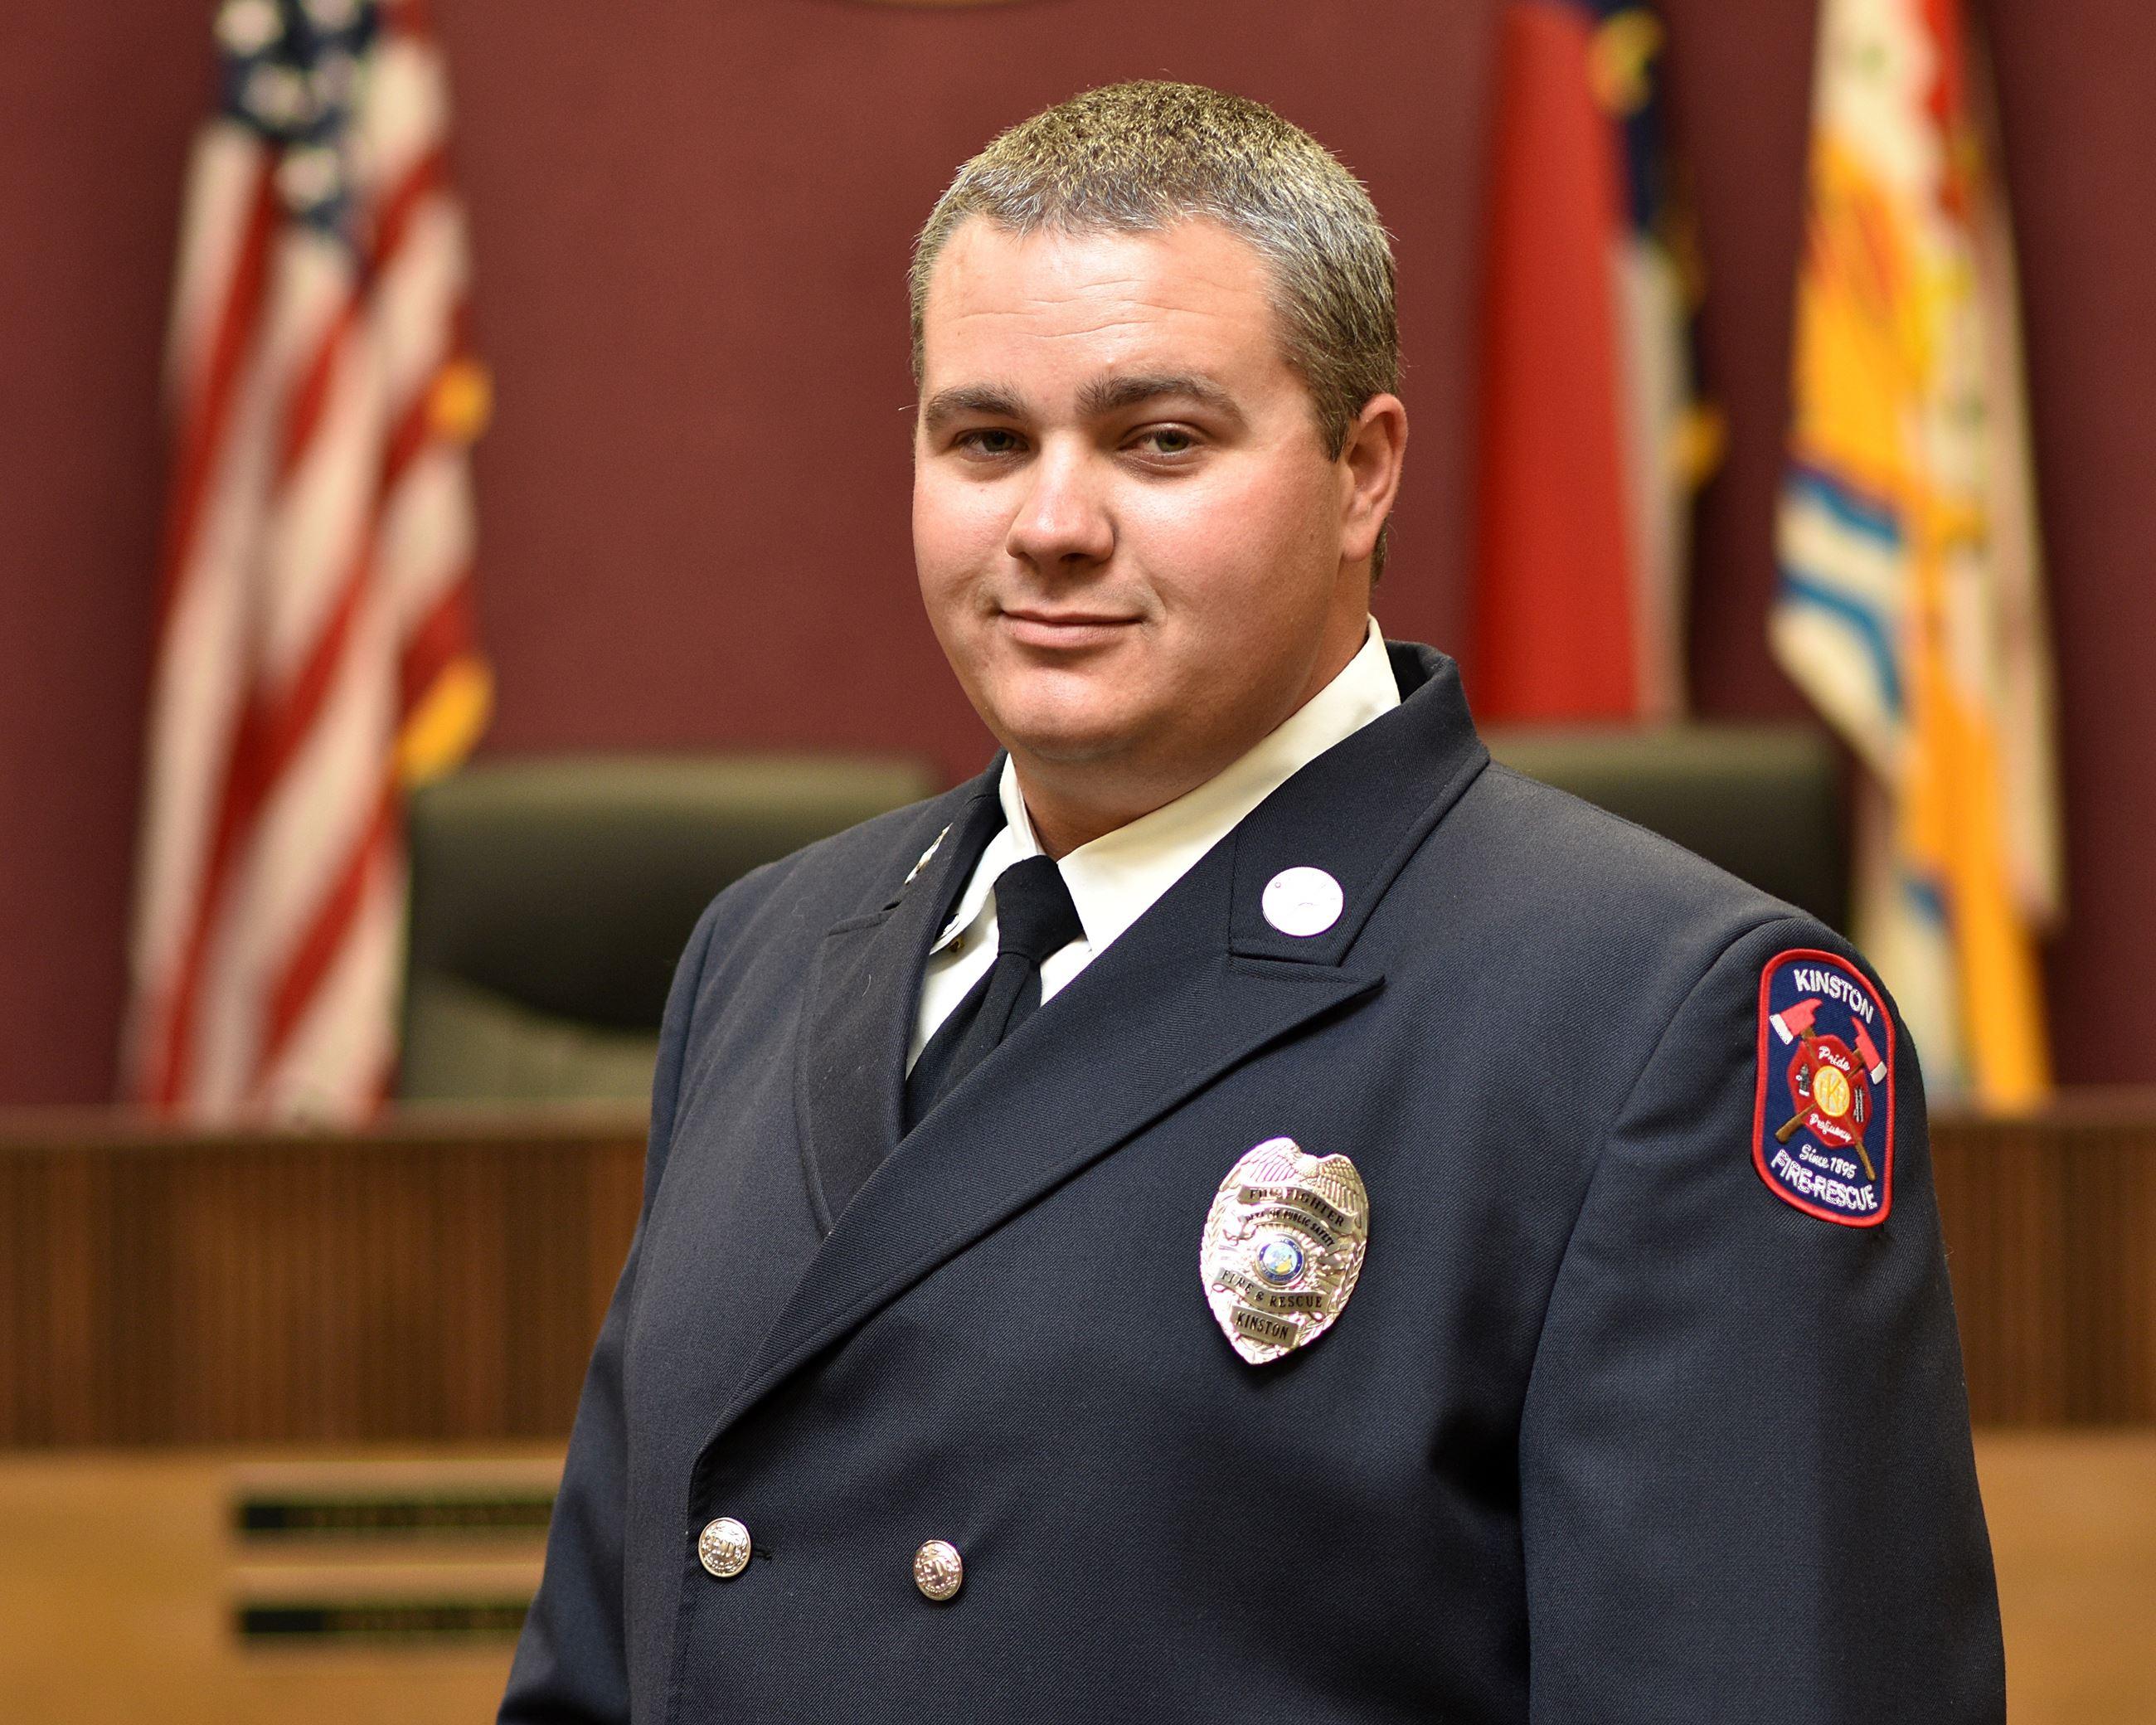 Fire Control Specialist I T. G. Foyles